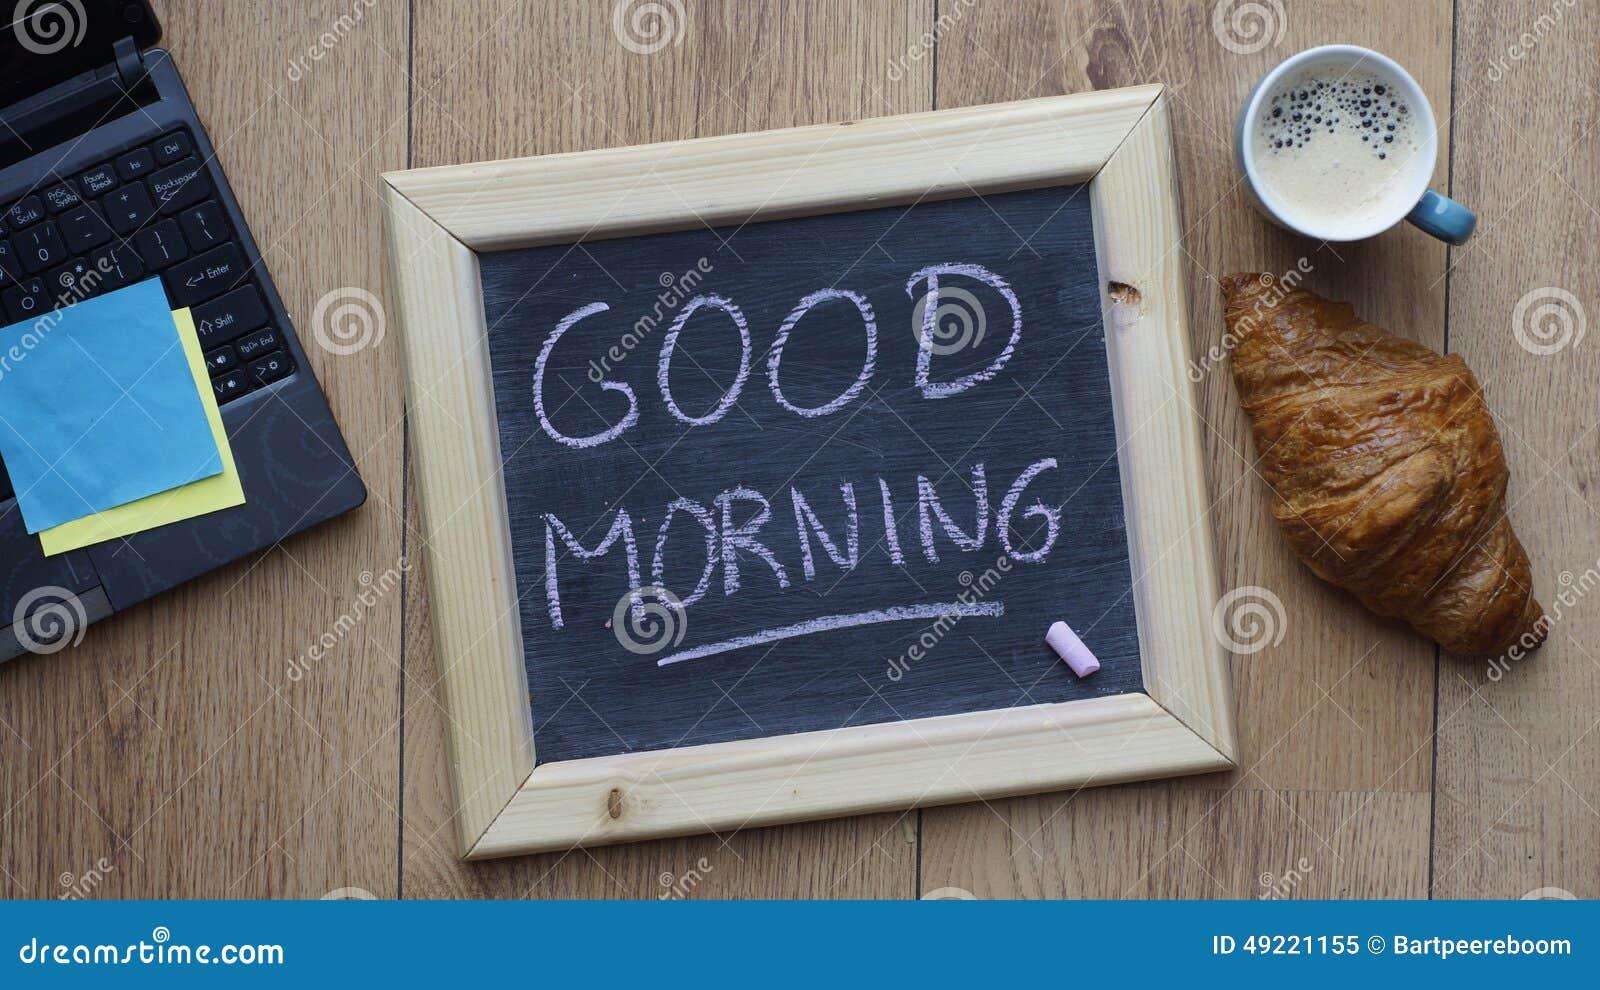 Good Morning Breakfast Stock Photo - Image: 49221155